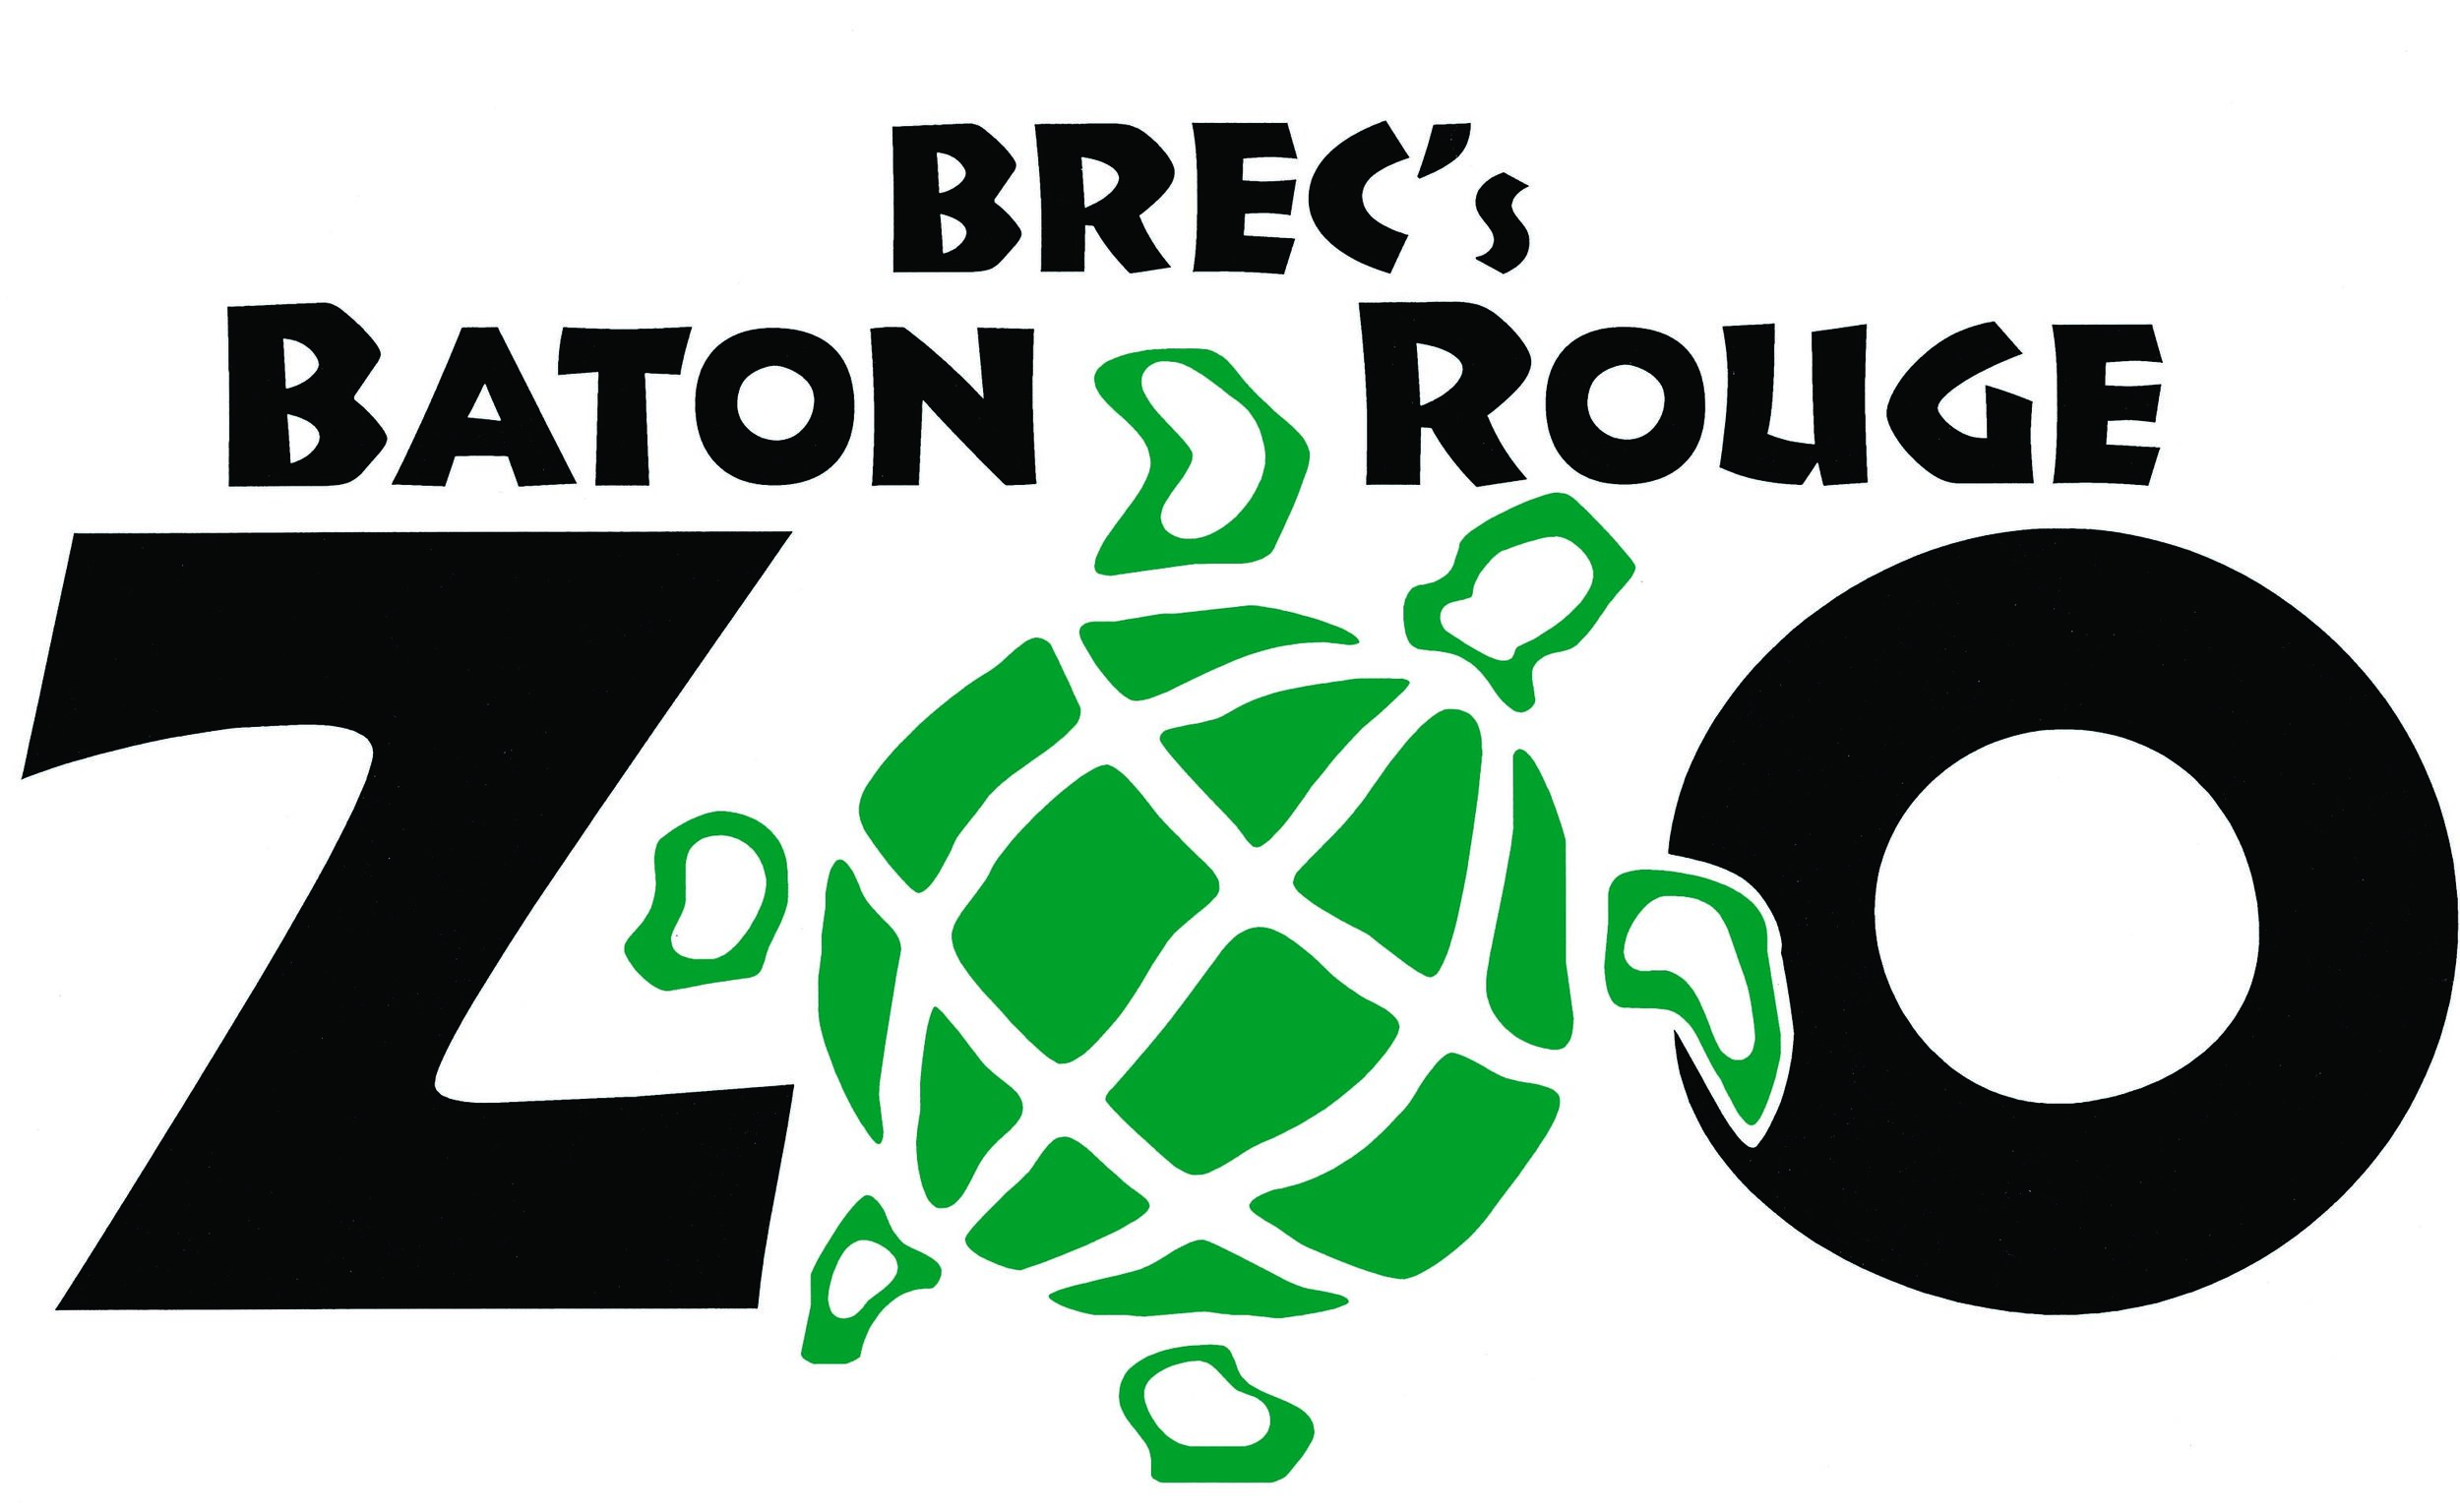 BREC's Baton Rouge Zoo.jpeg